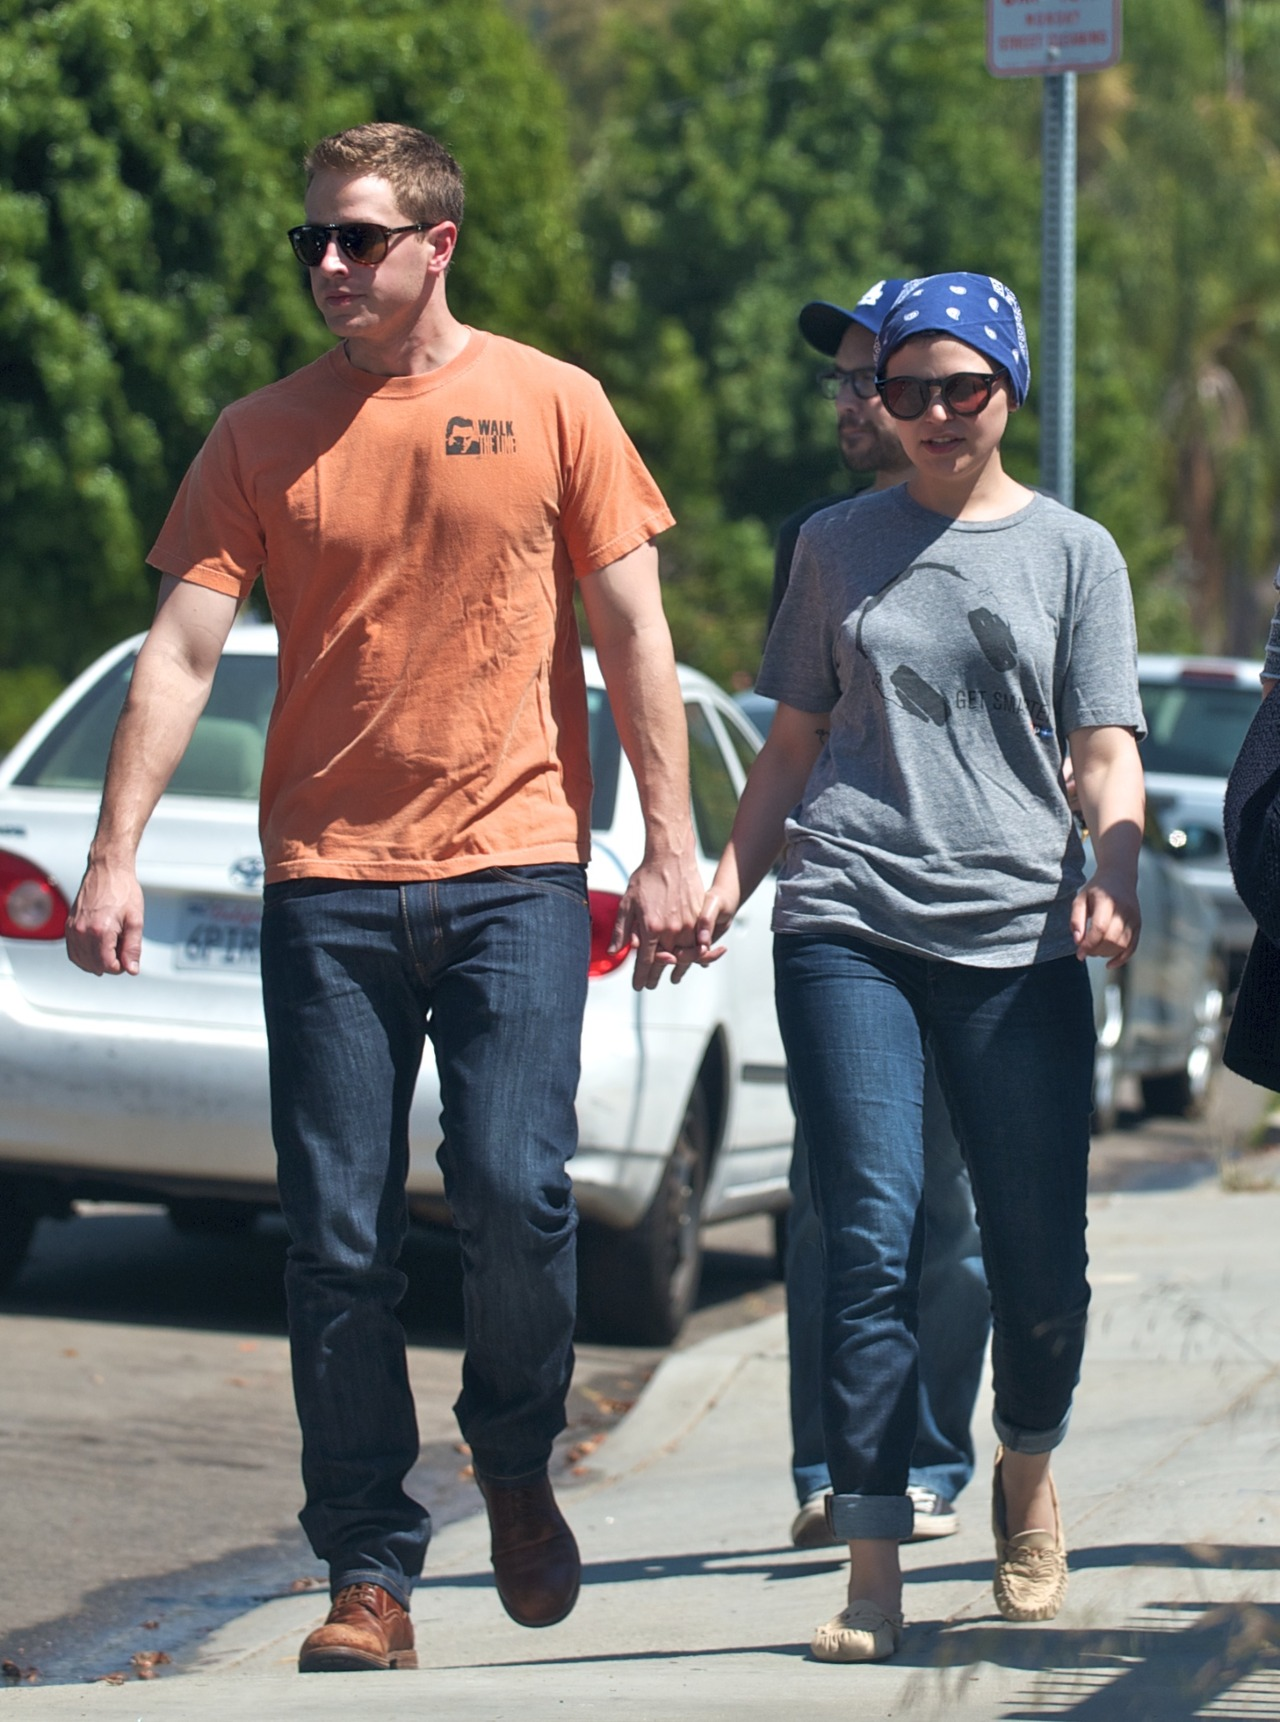 Josh&Ginny - Ginni...